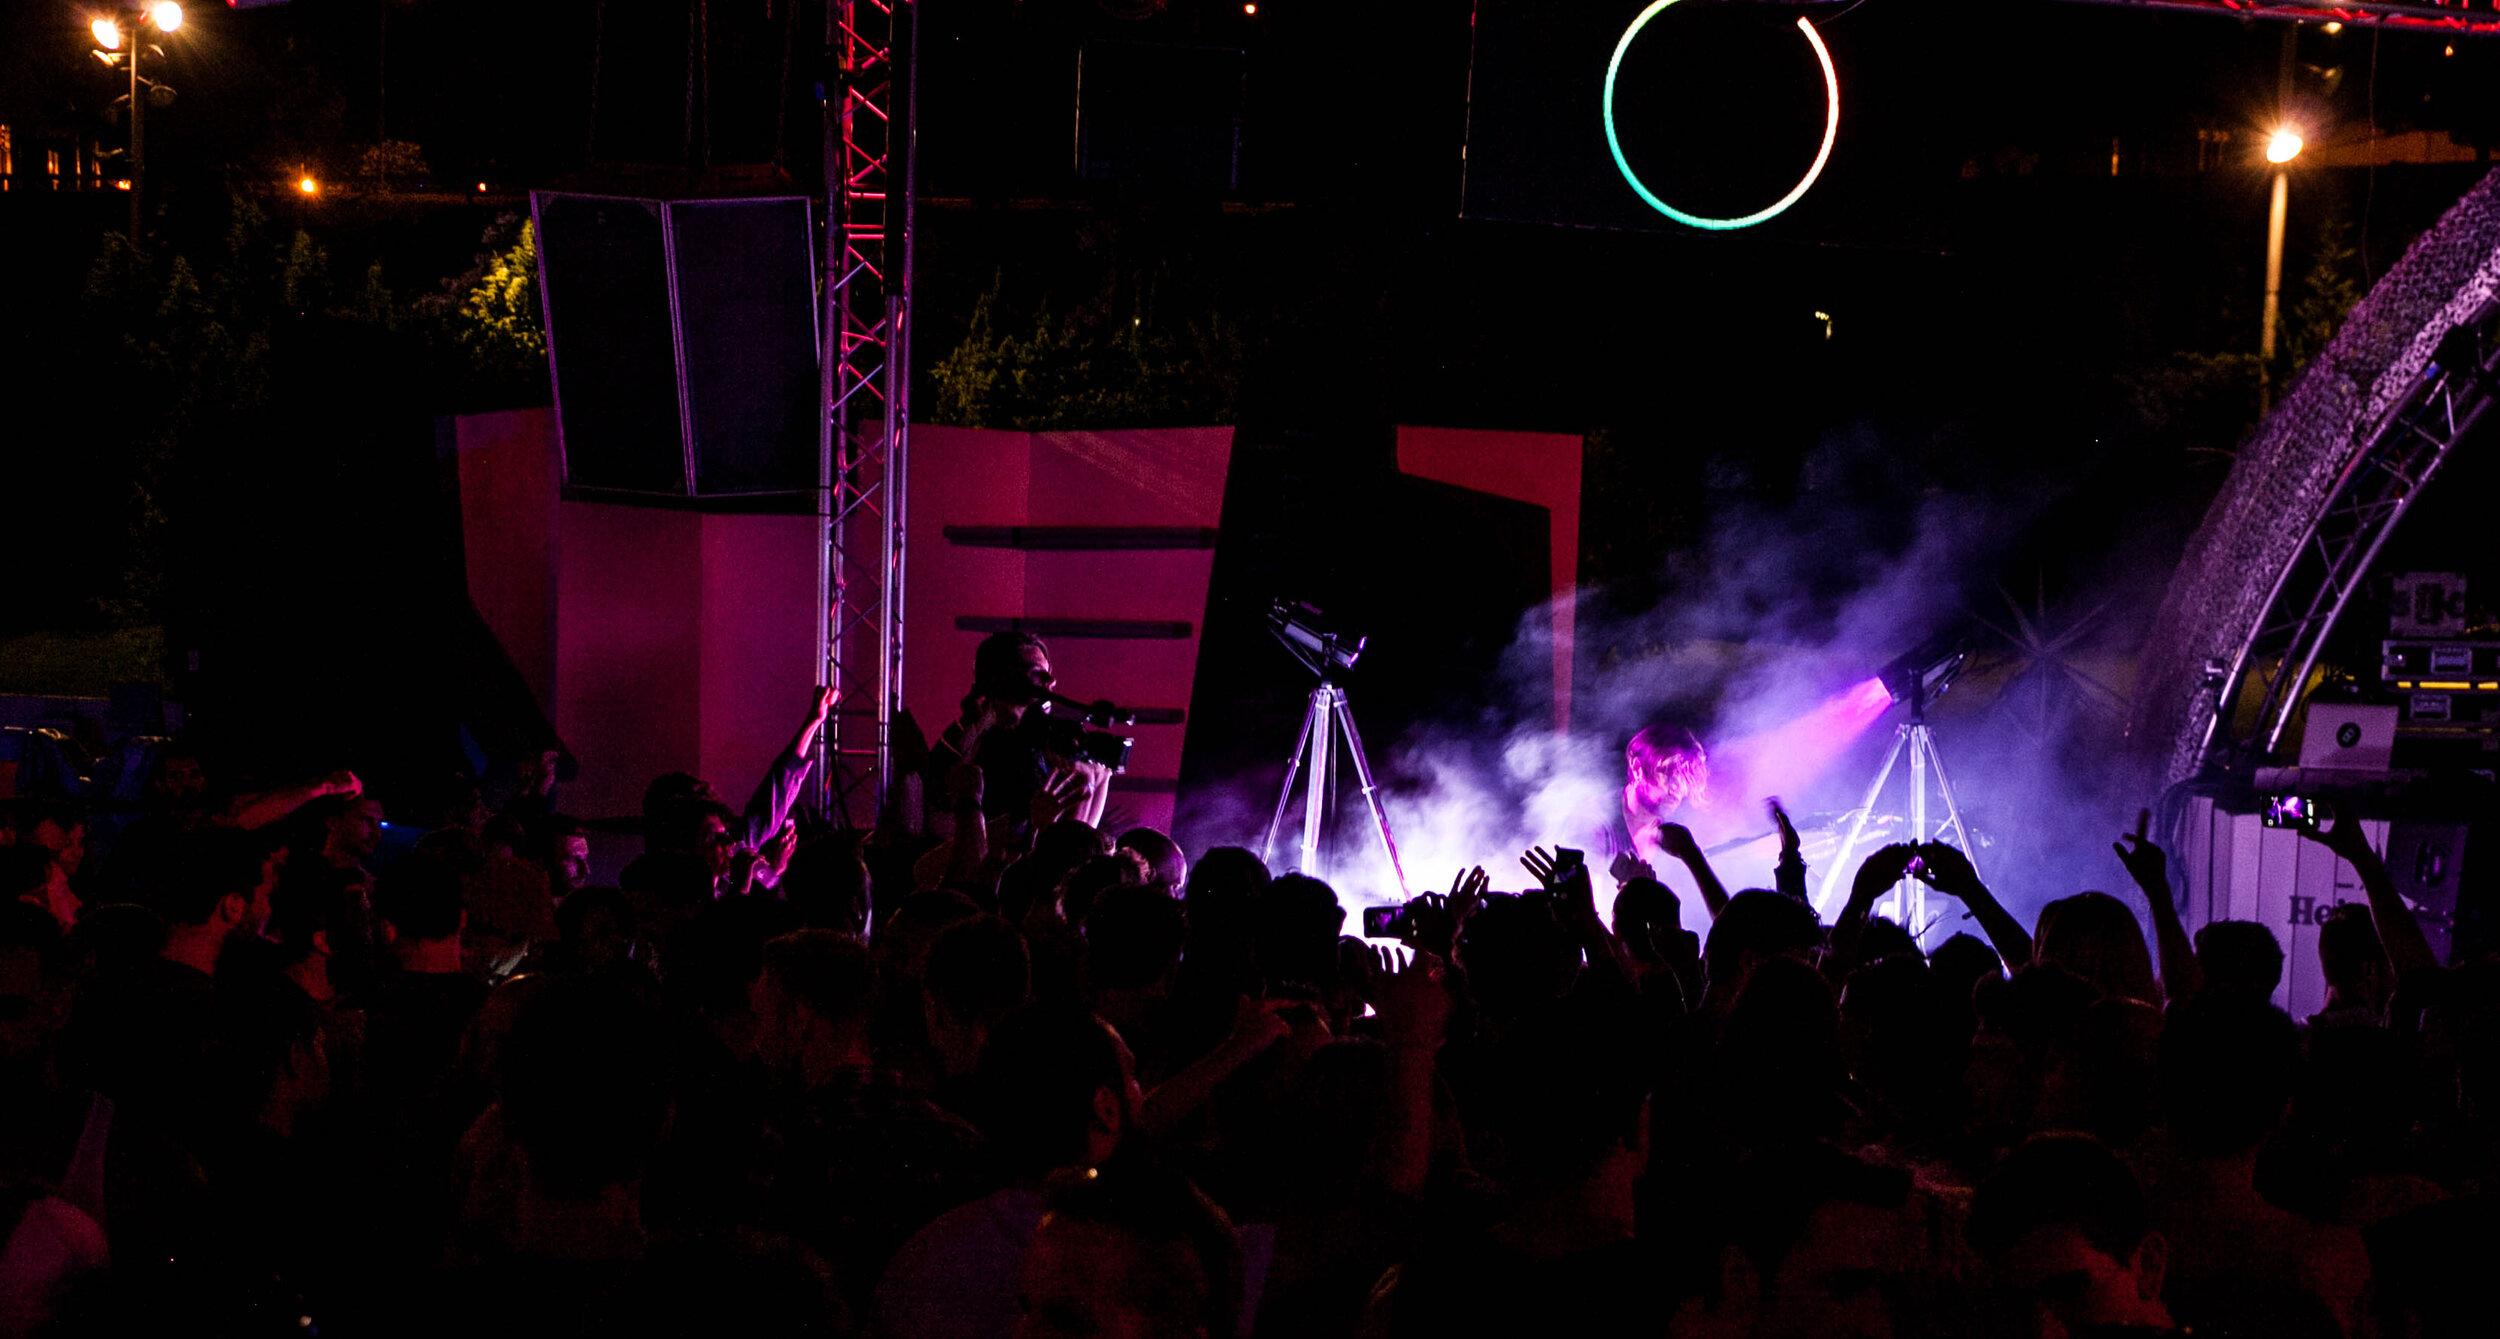 Rodriguez Jr. Live en su show Visualized. 2016, Barcelona. Pic by Marta Vilardell.